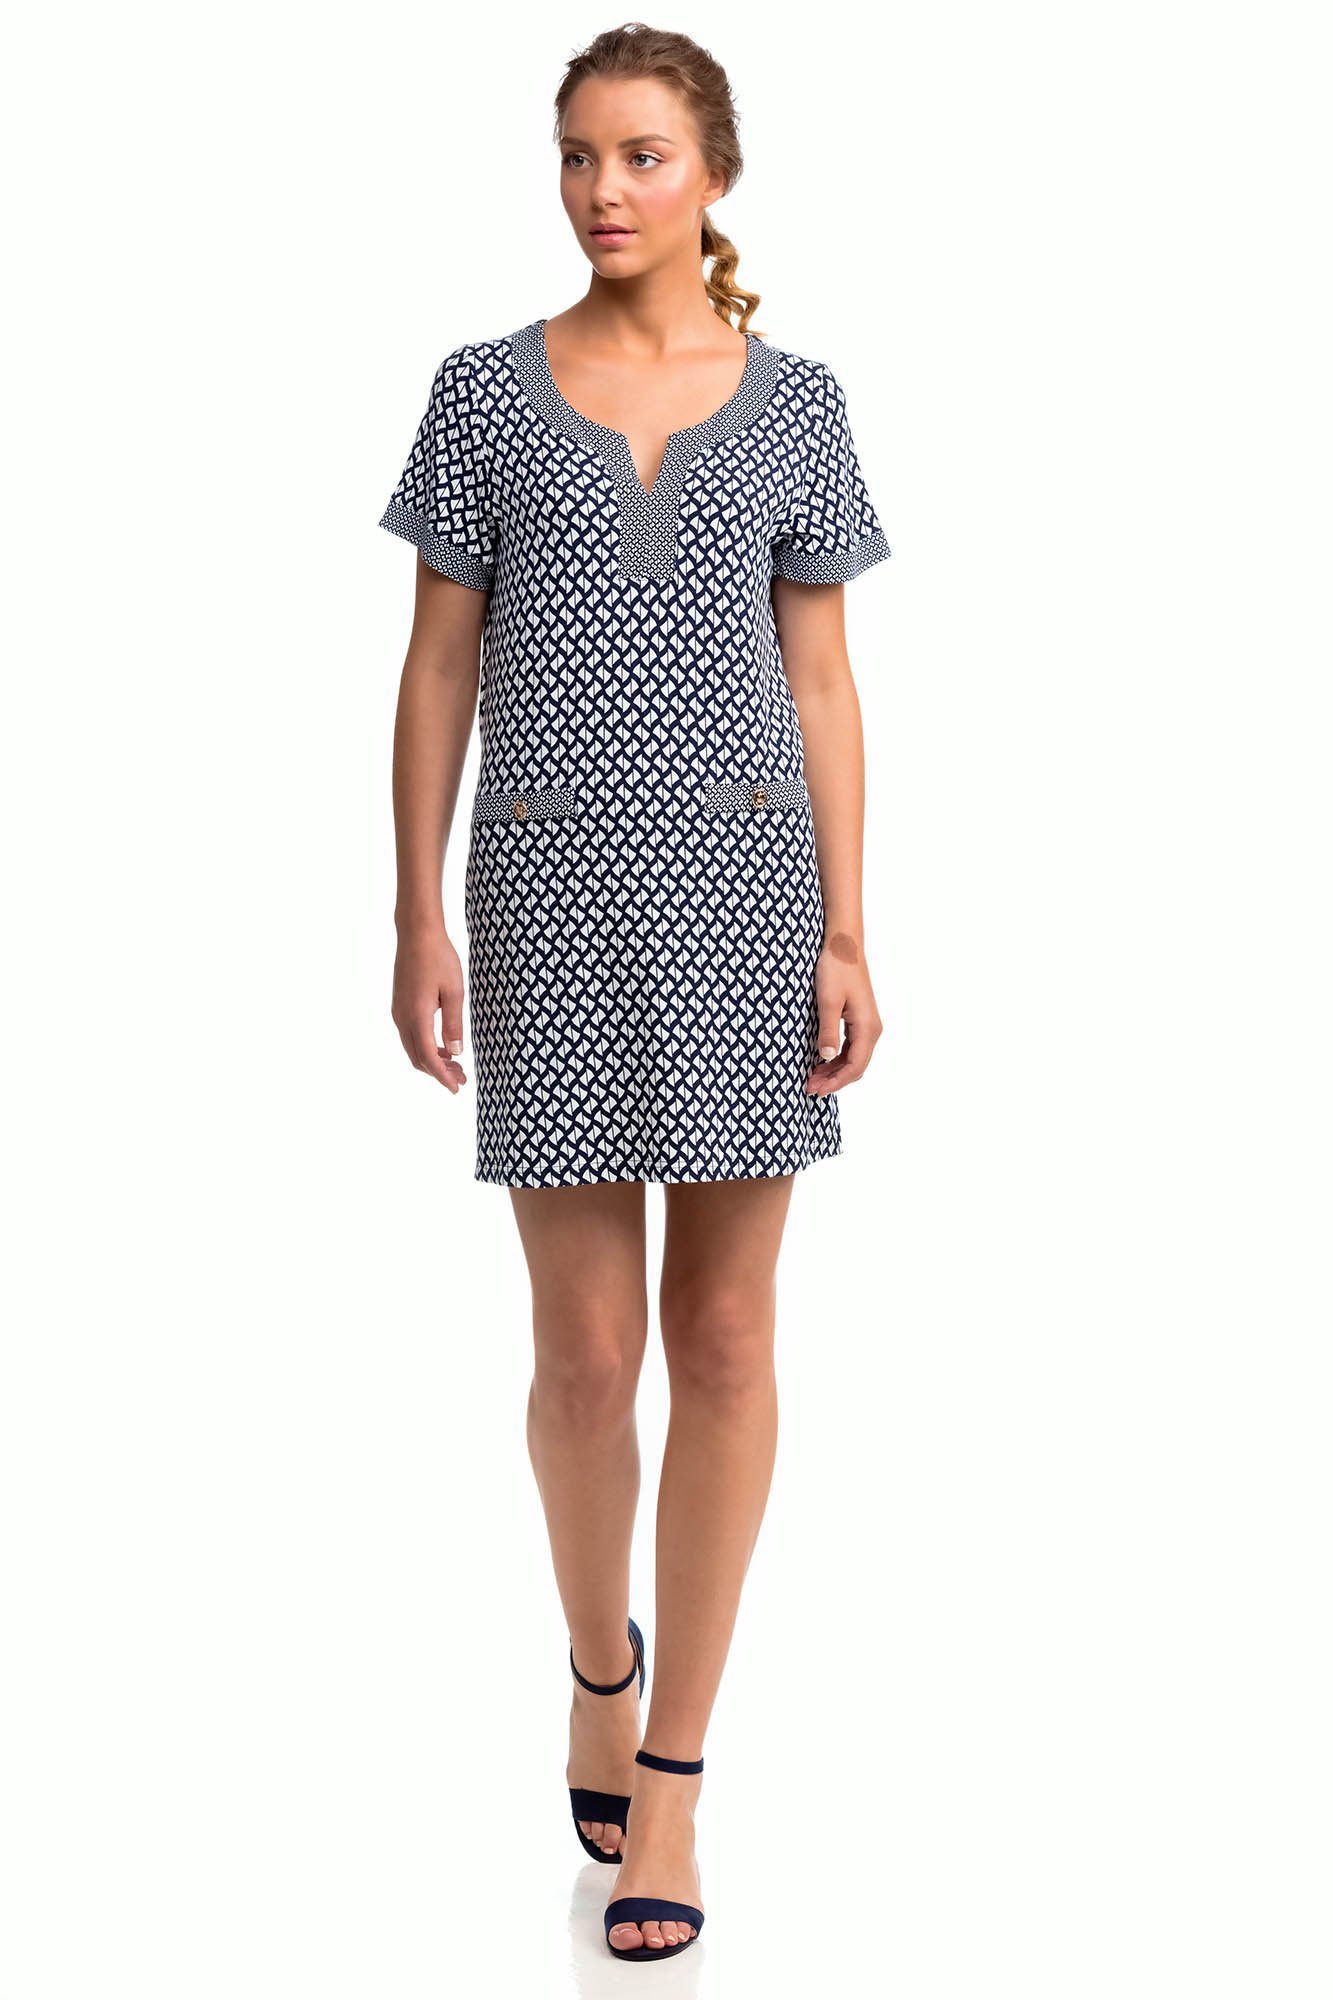 Vamp - Letné dámske šaty 14450 - Vamp blue m